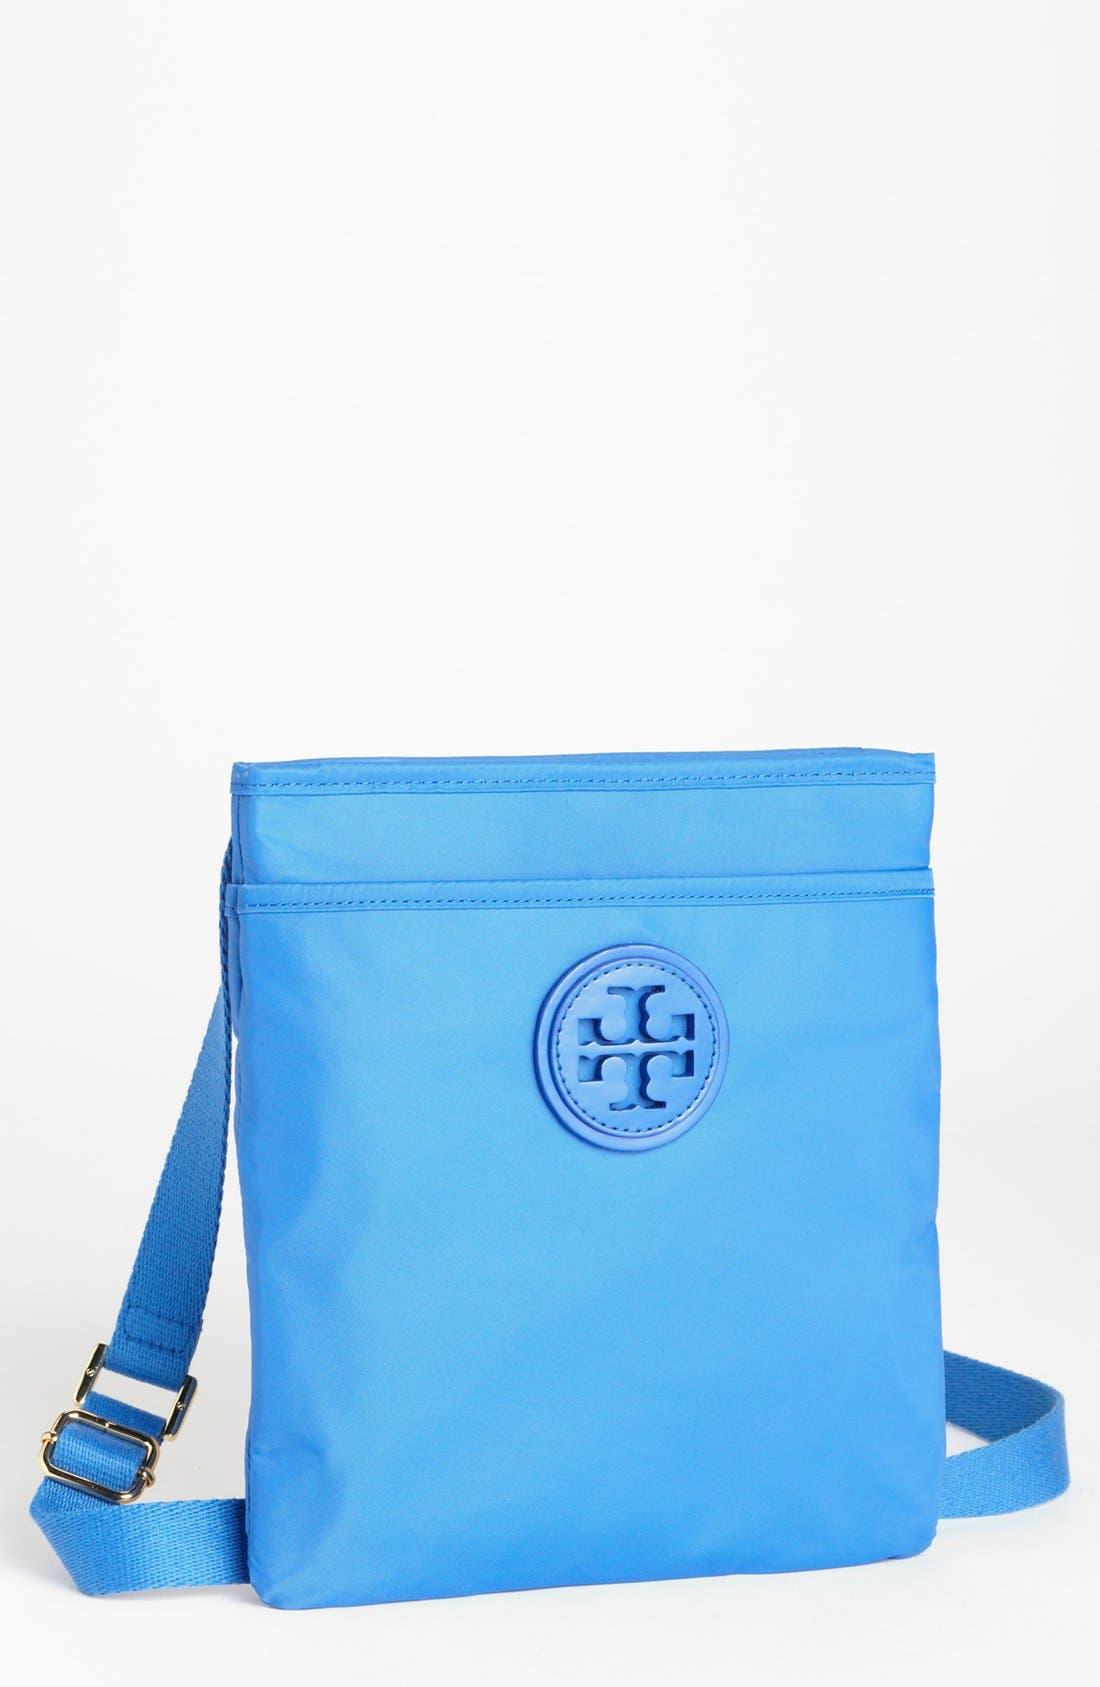 Main Image - Tory Burch Nylon Crossbody Bag